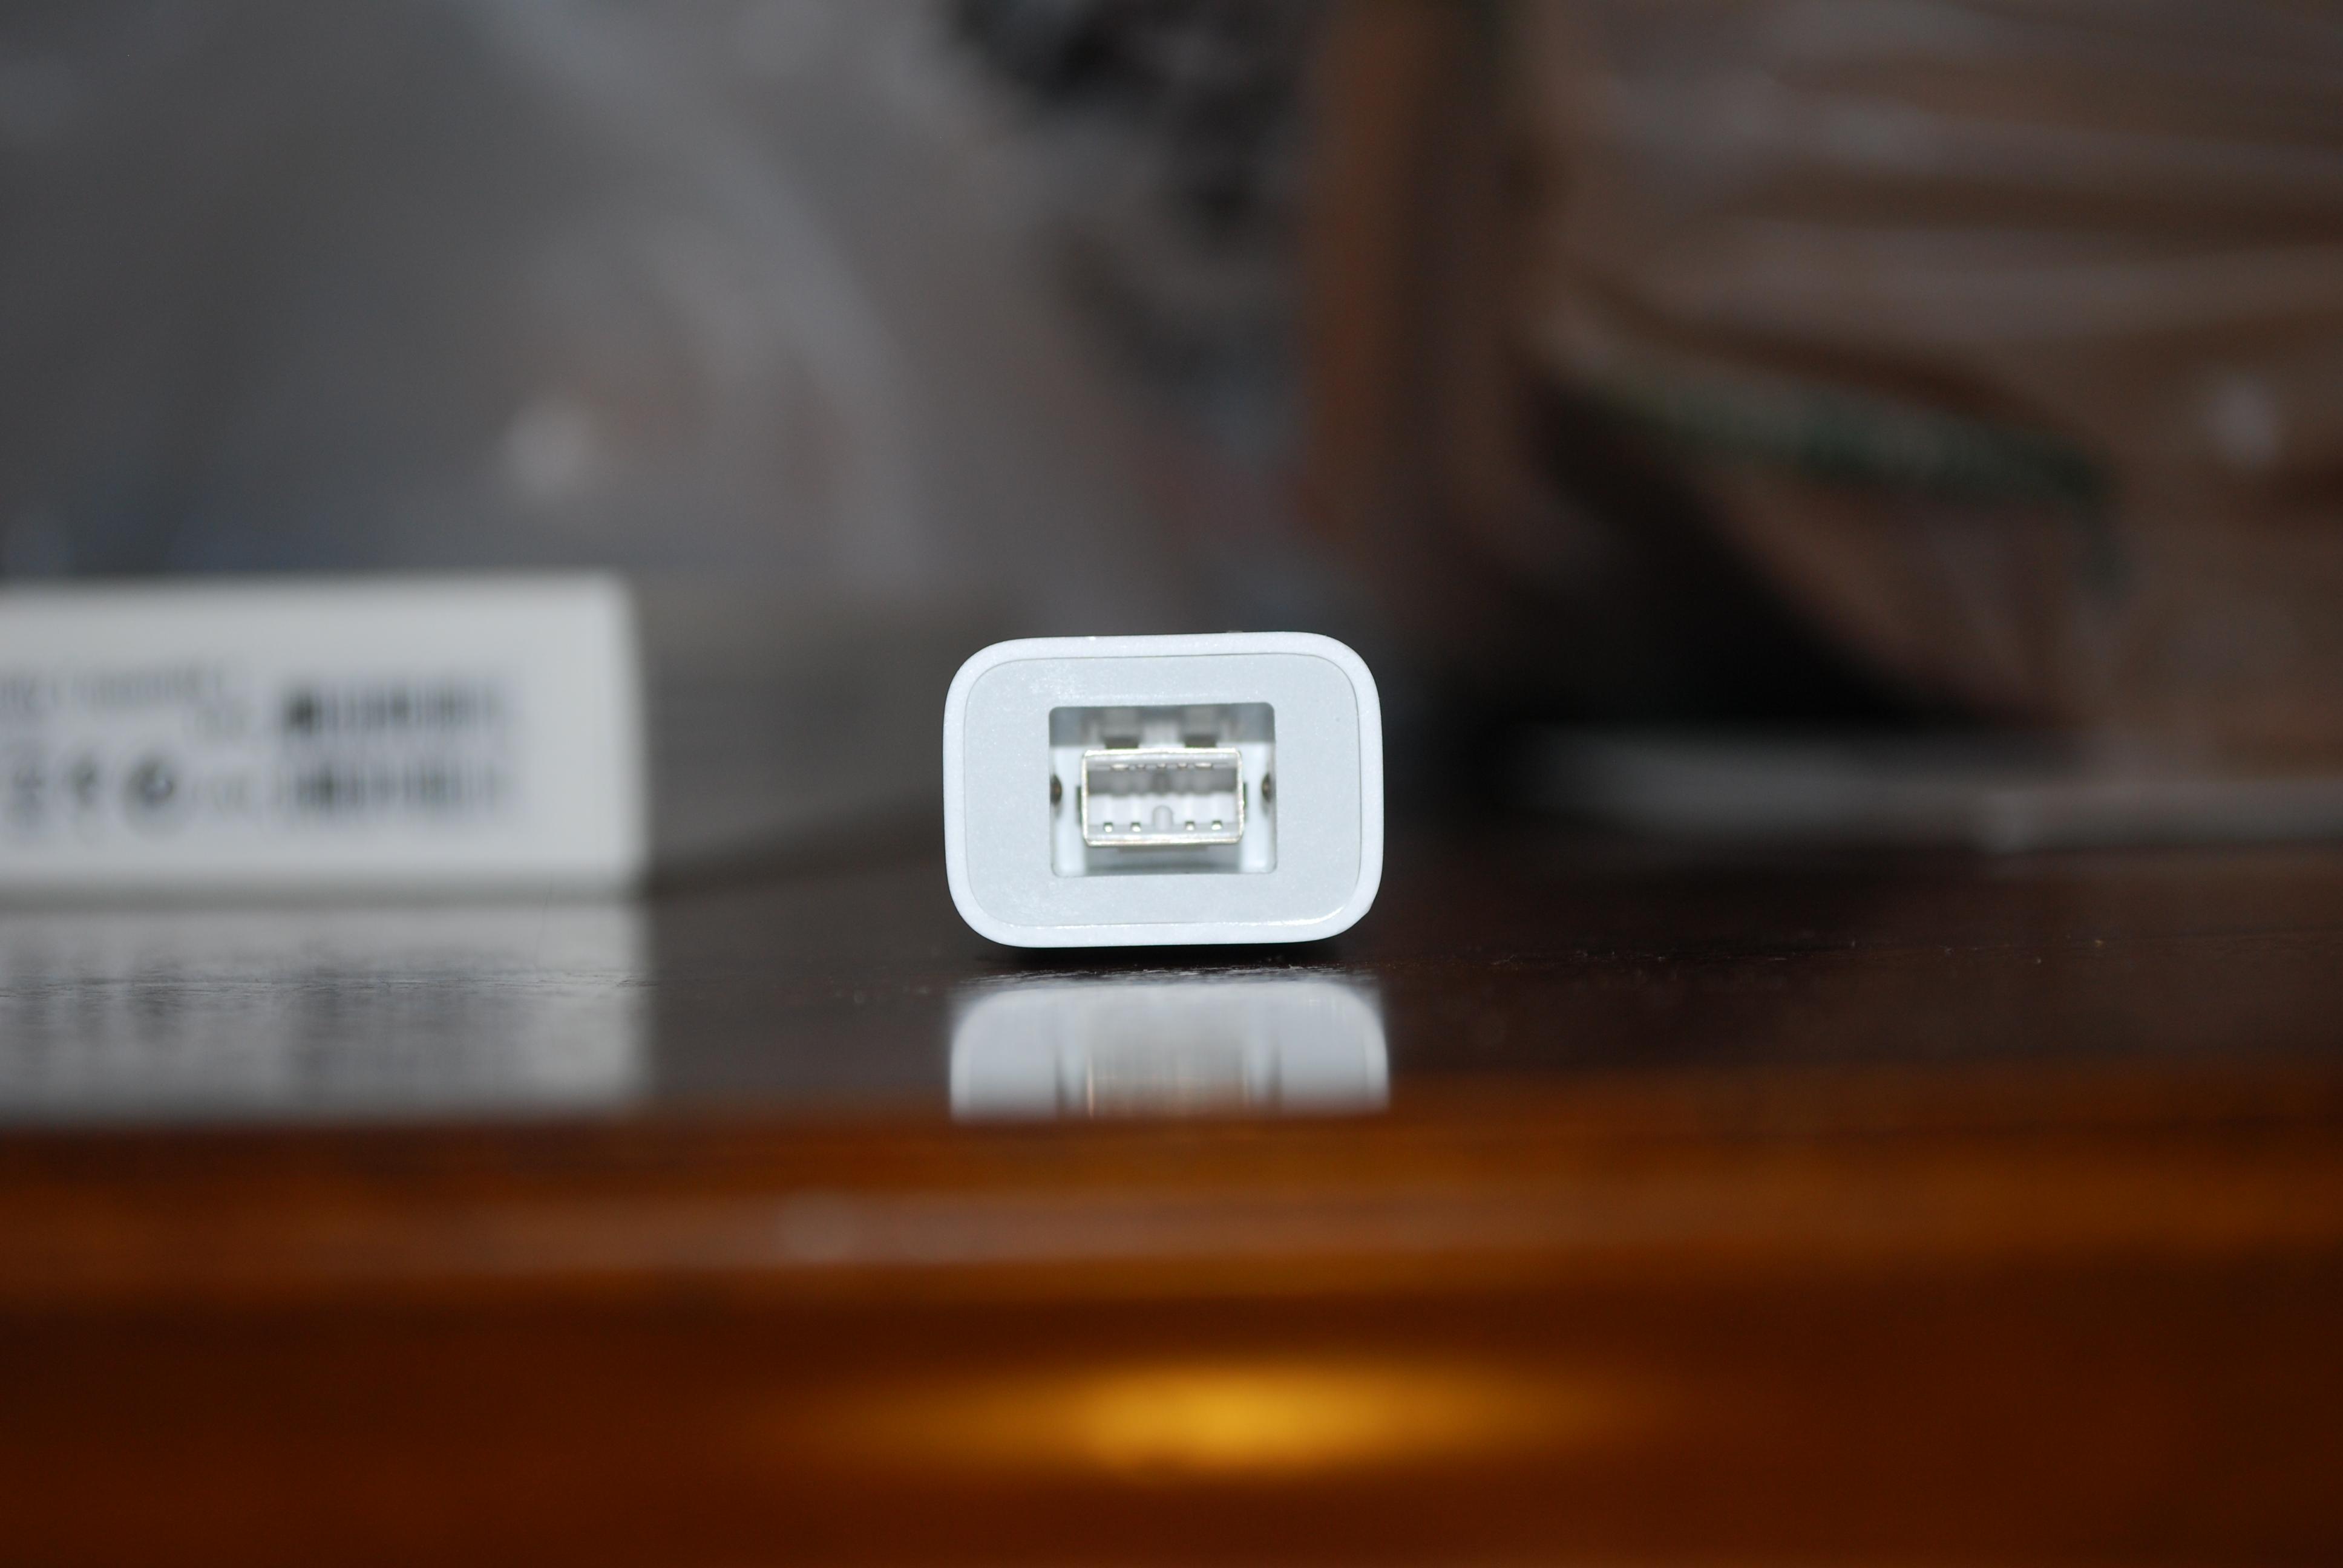 apple-firewire-thunderbolt-adapter-tip